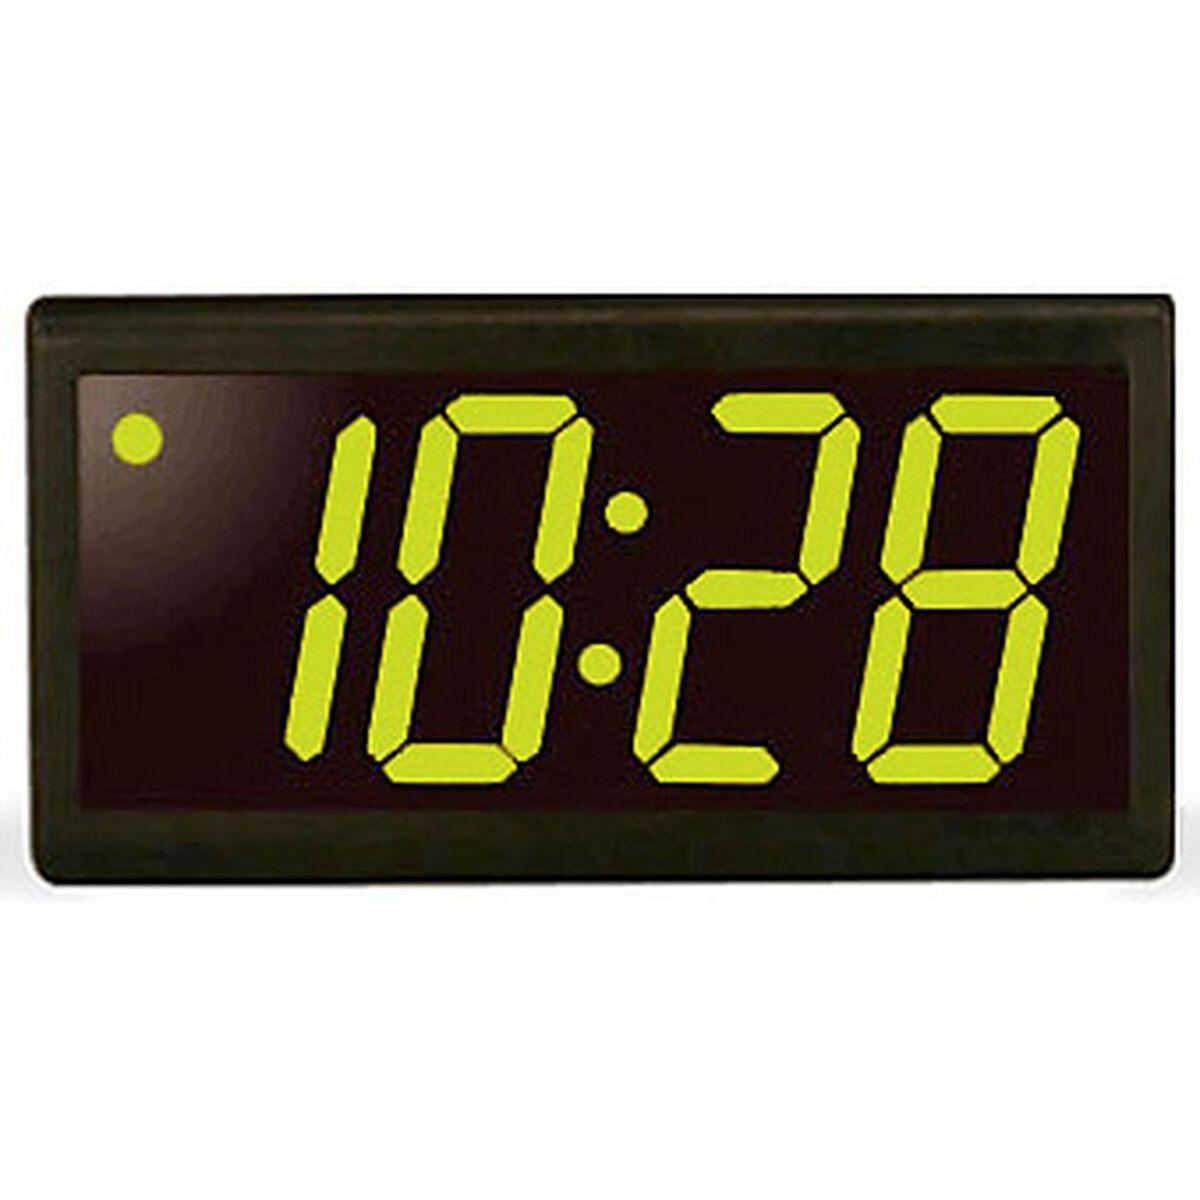 Digital wall clocks 4 digit 4 green led black plastic poe clock amipublicfo Image collections